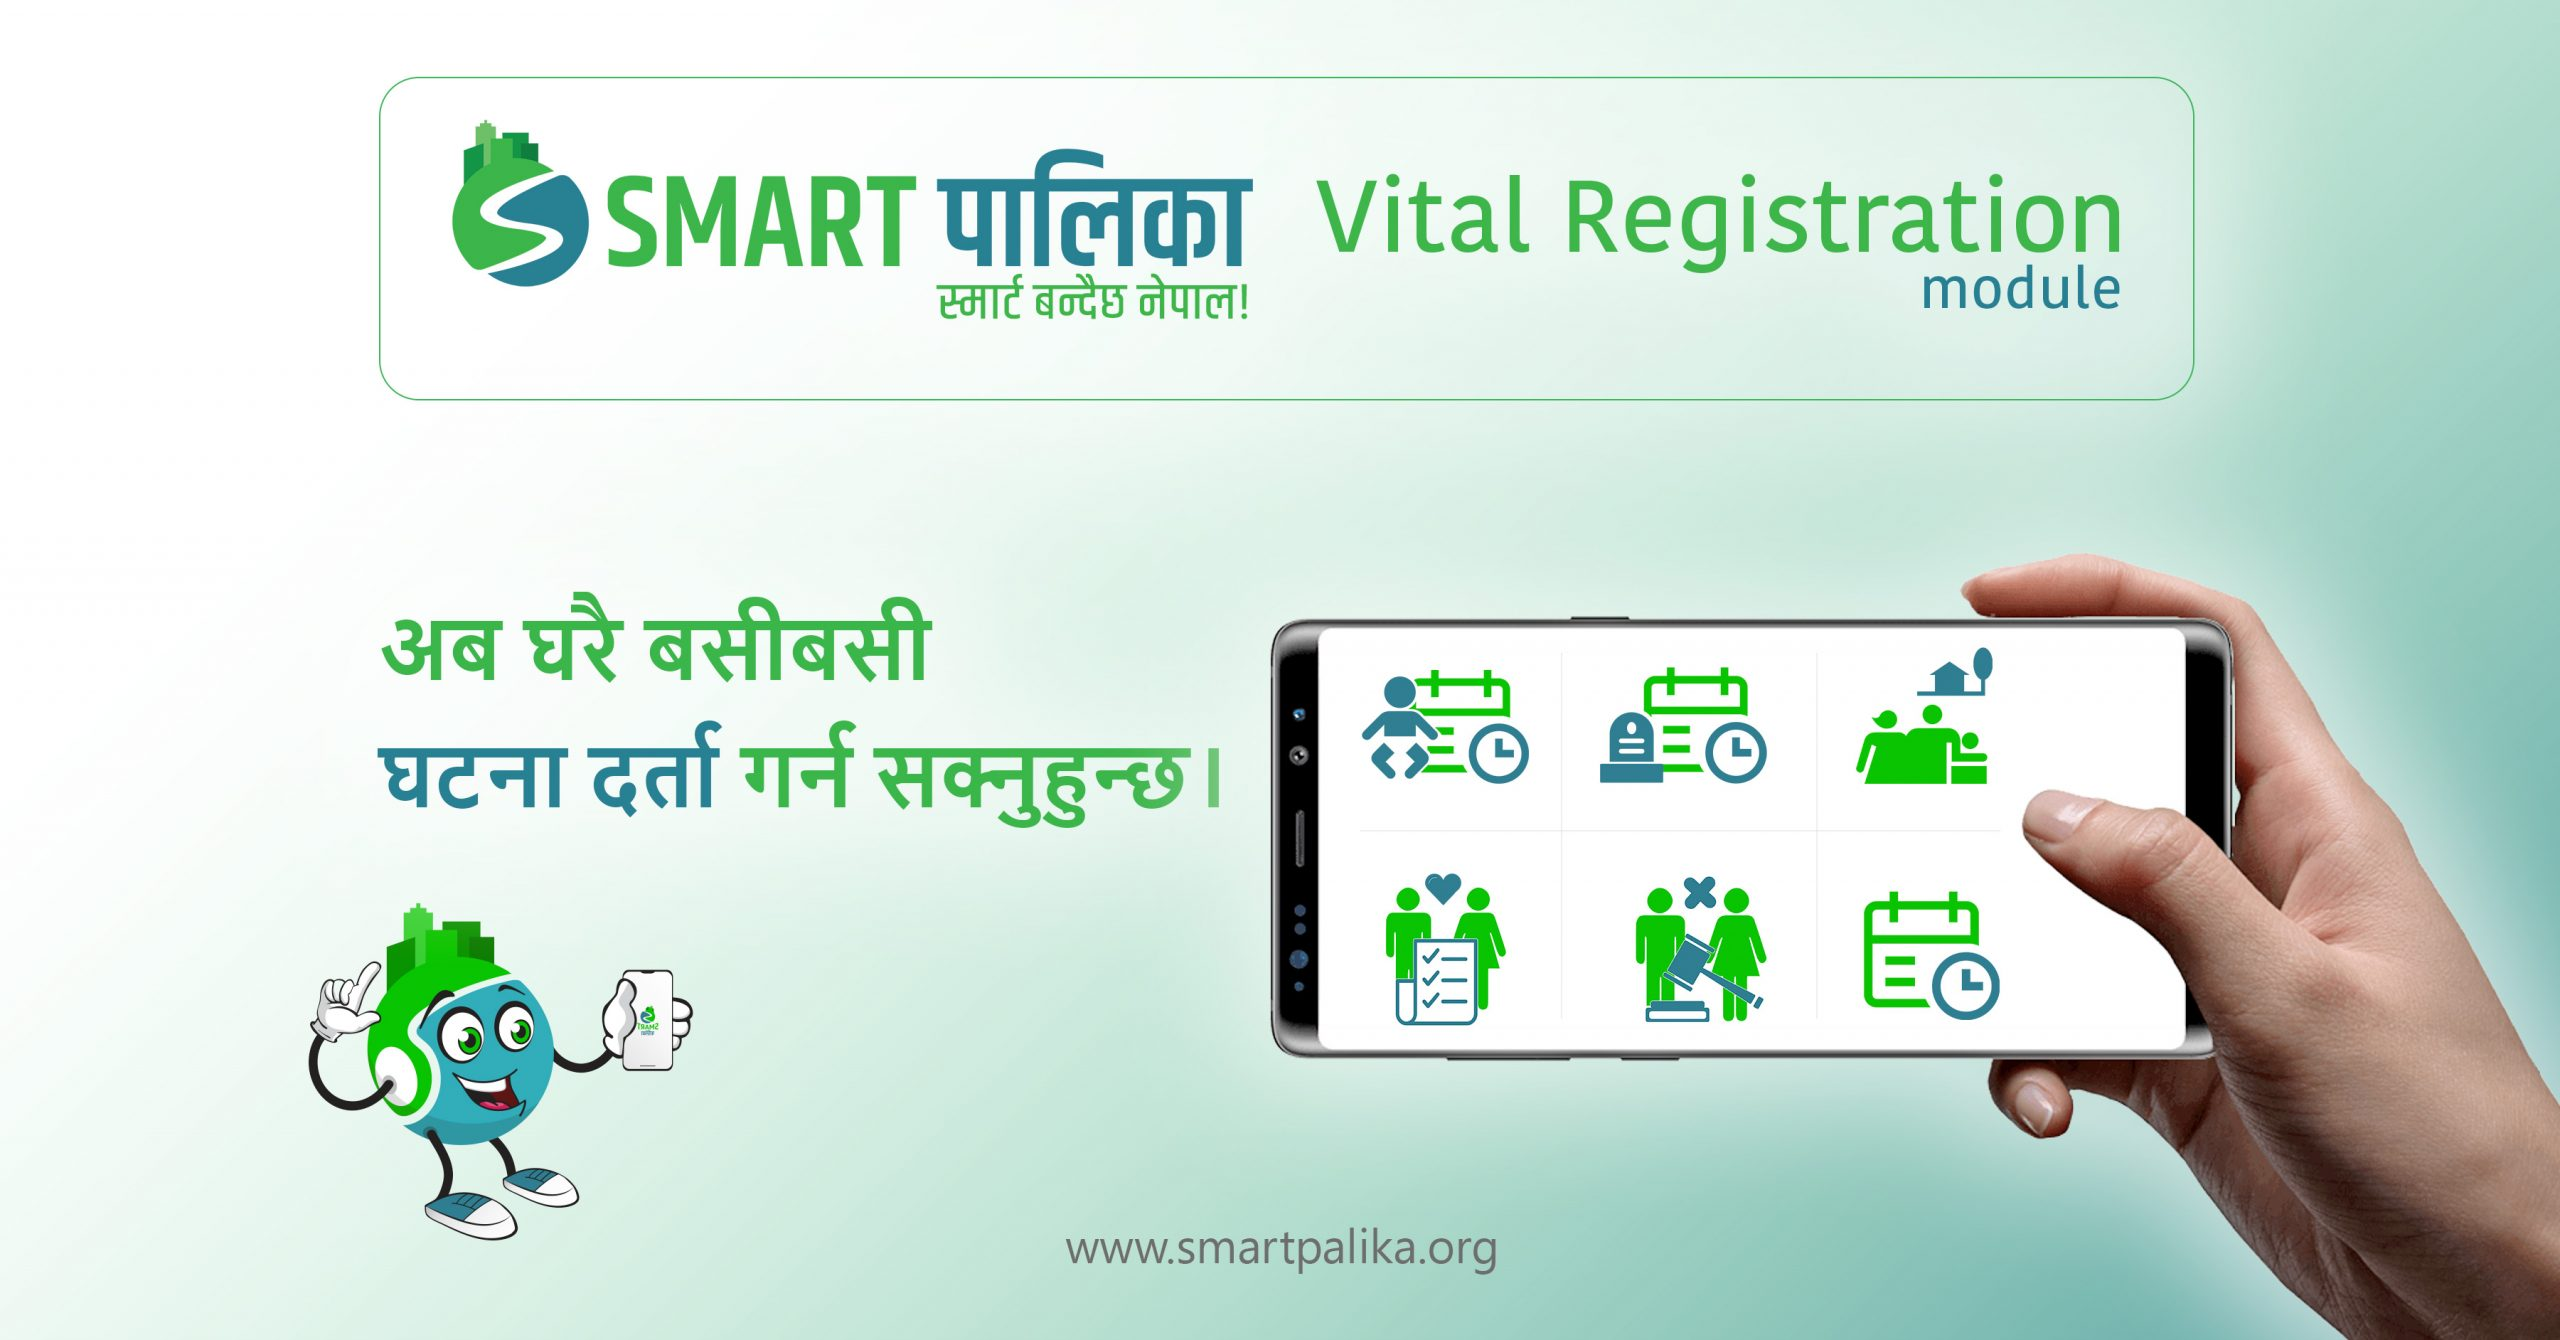 SmartPalika Vital-Registration Banner